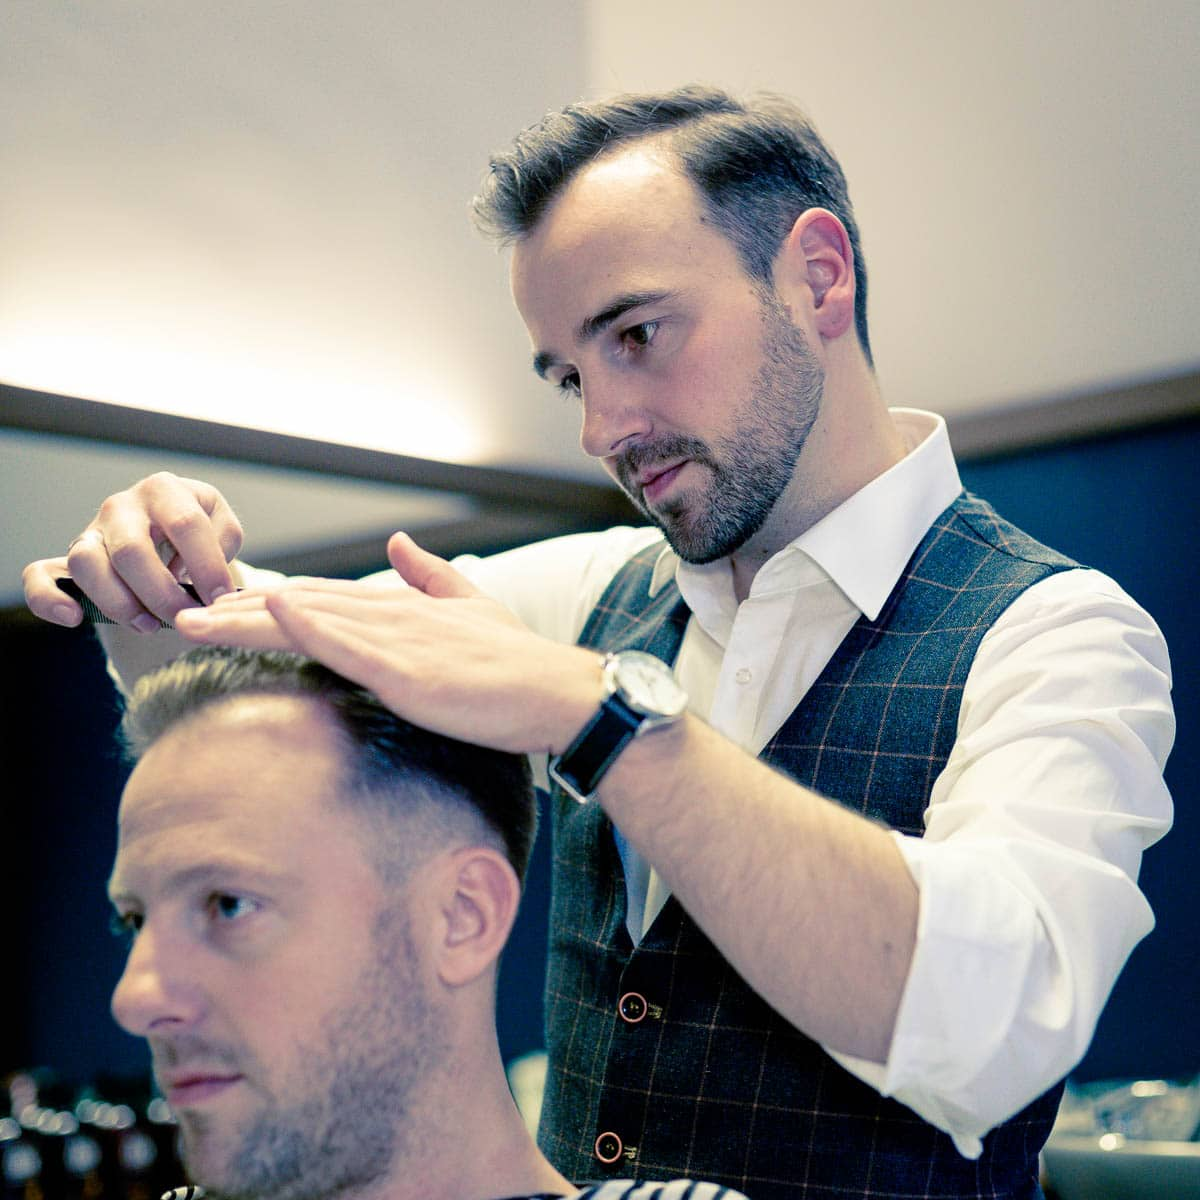 The-Barber-Erfurt_028